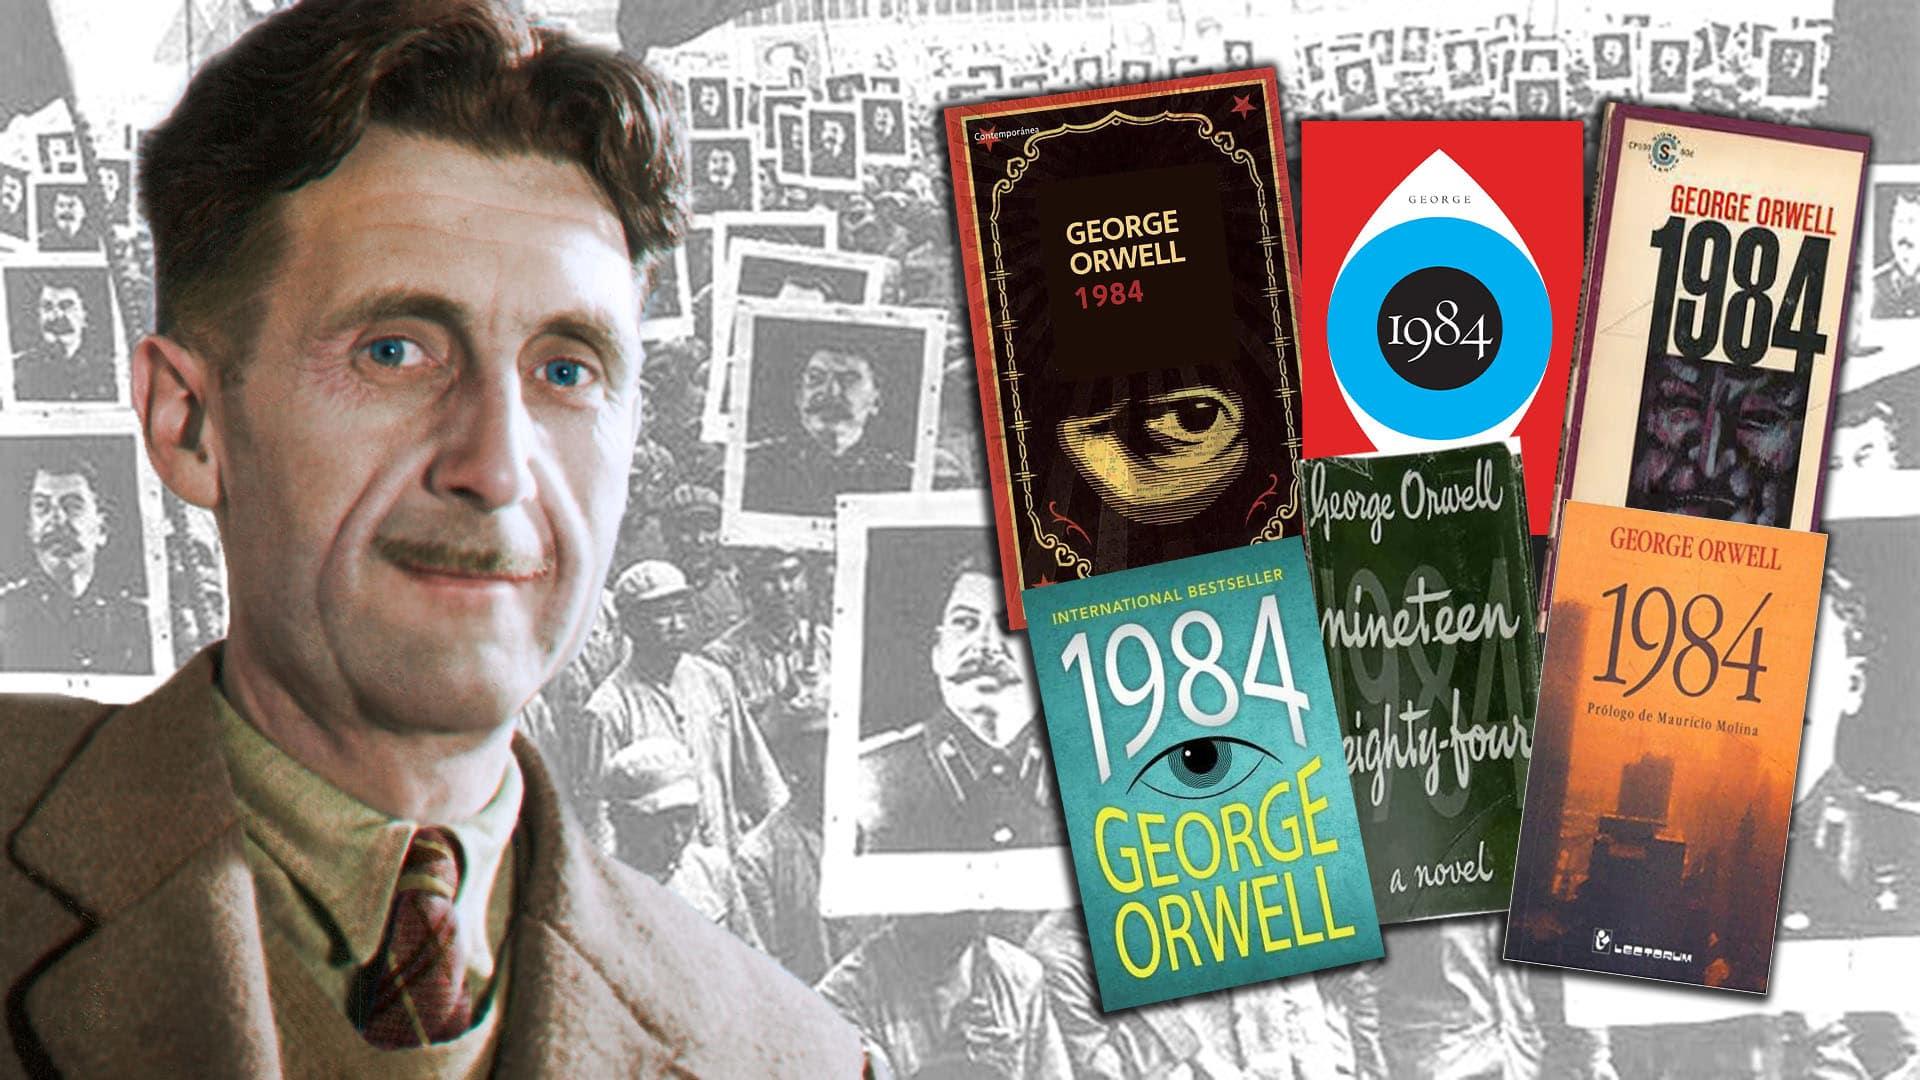 1984-de-george-orwell-5